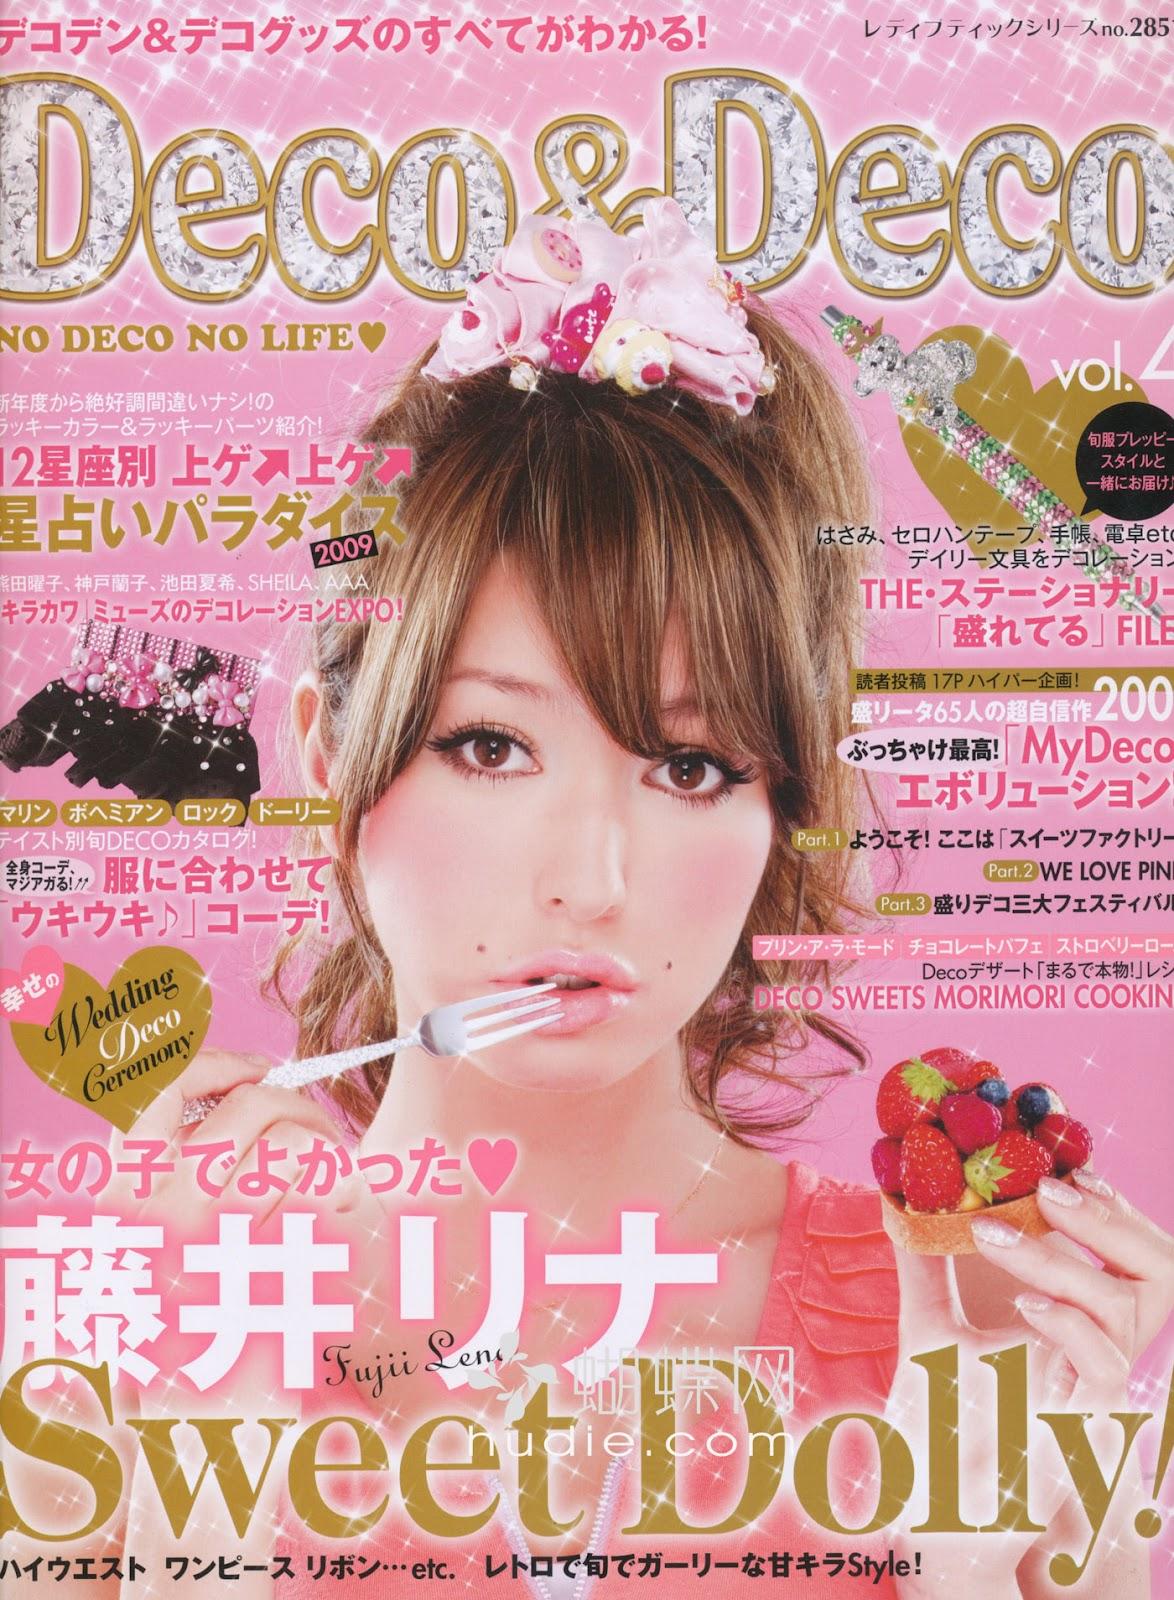 deco deco 2009 vilume 4 japanese magazine scans